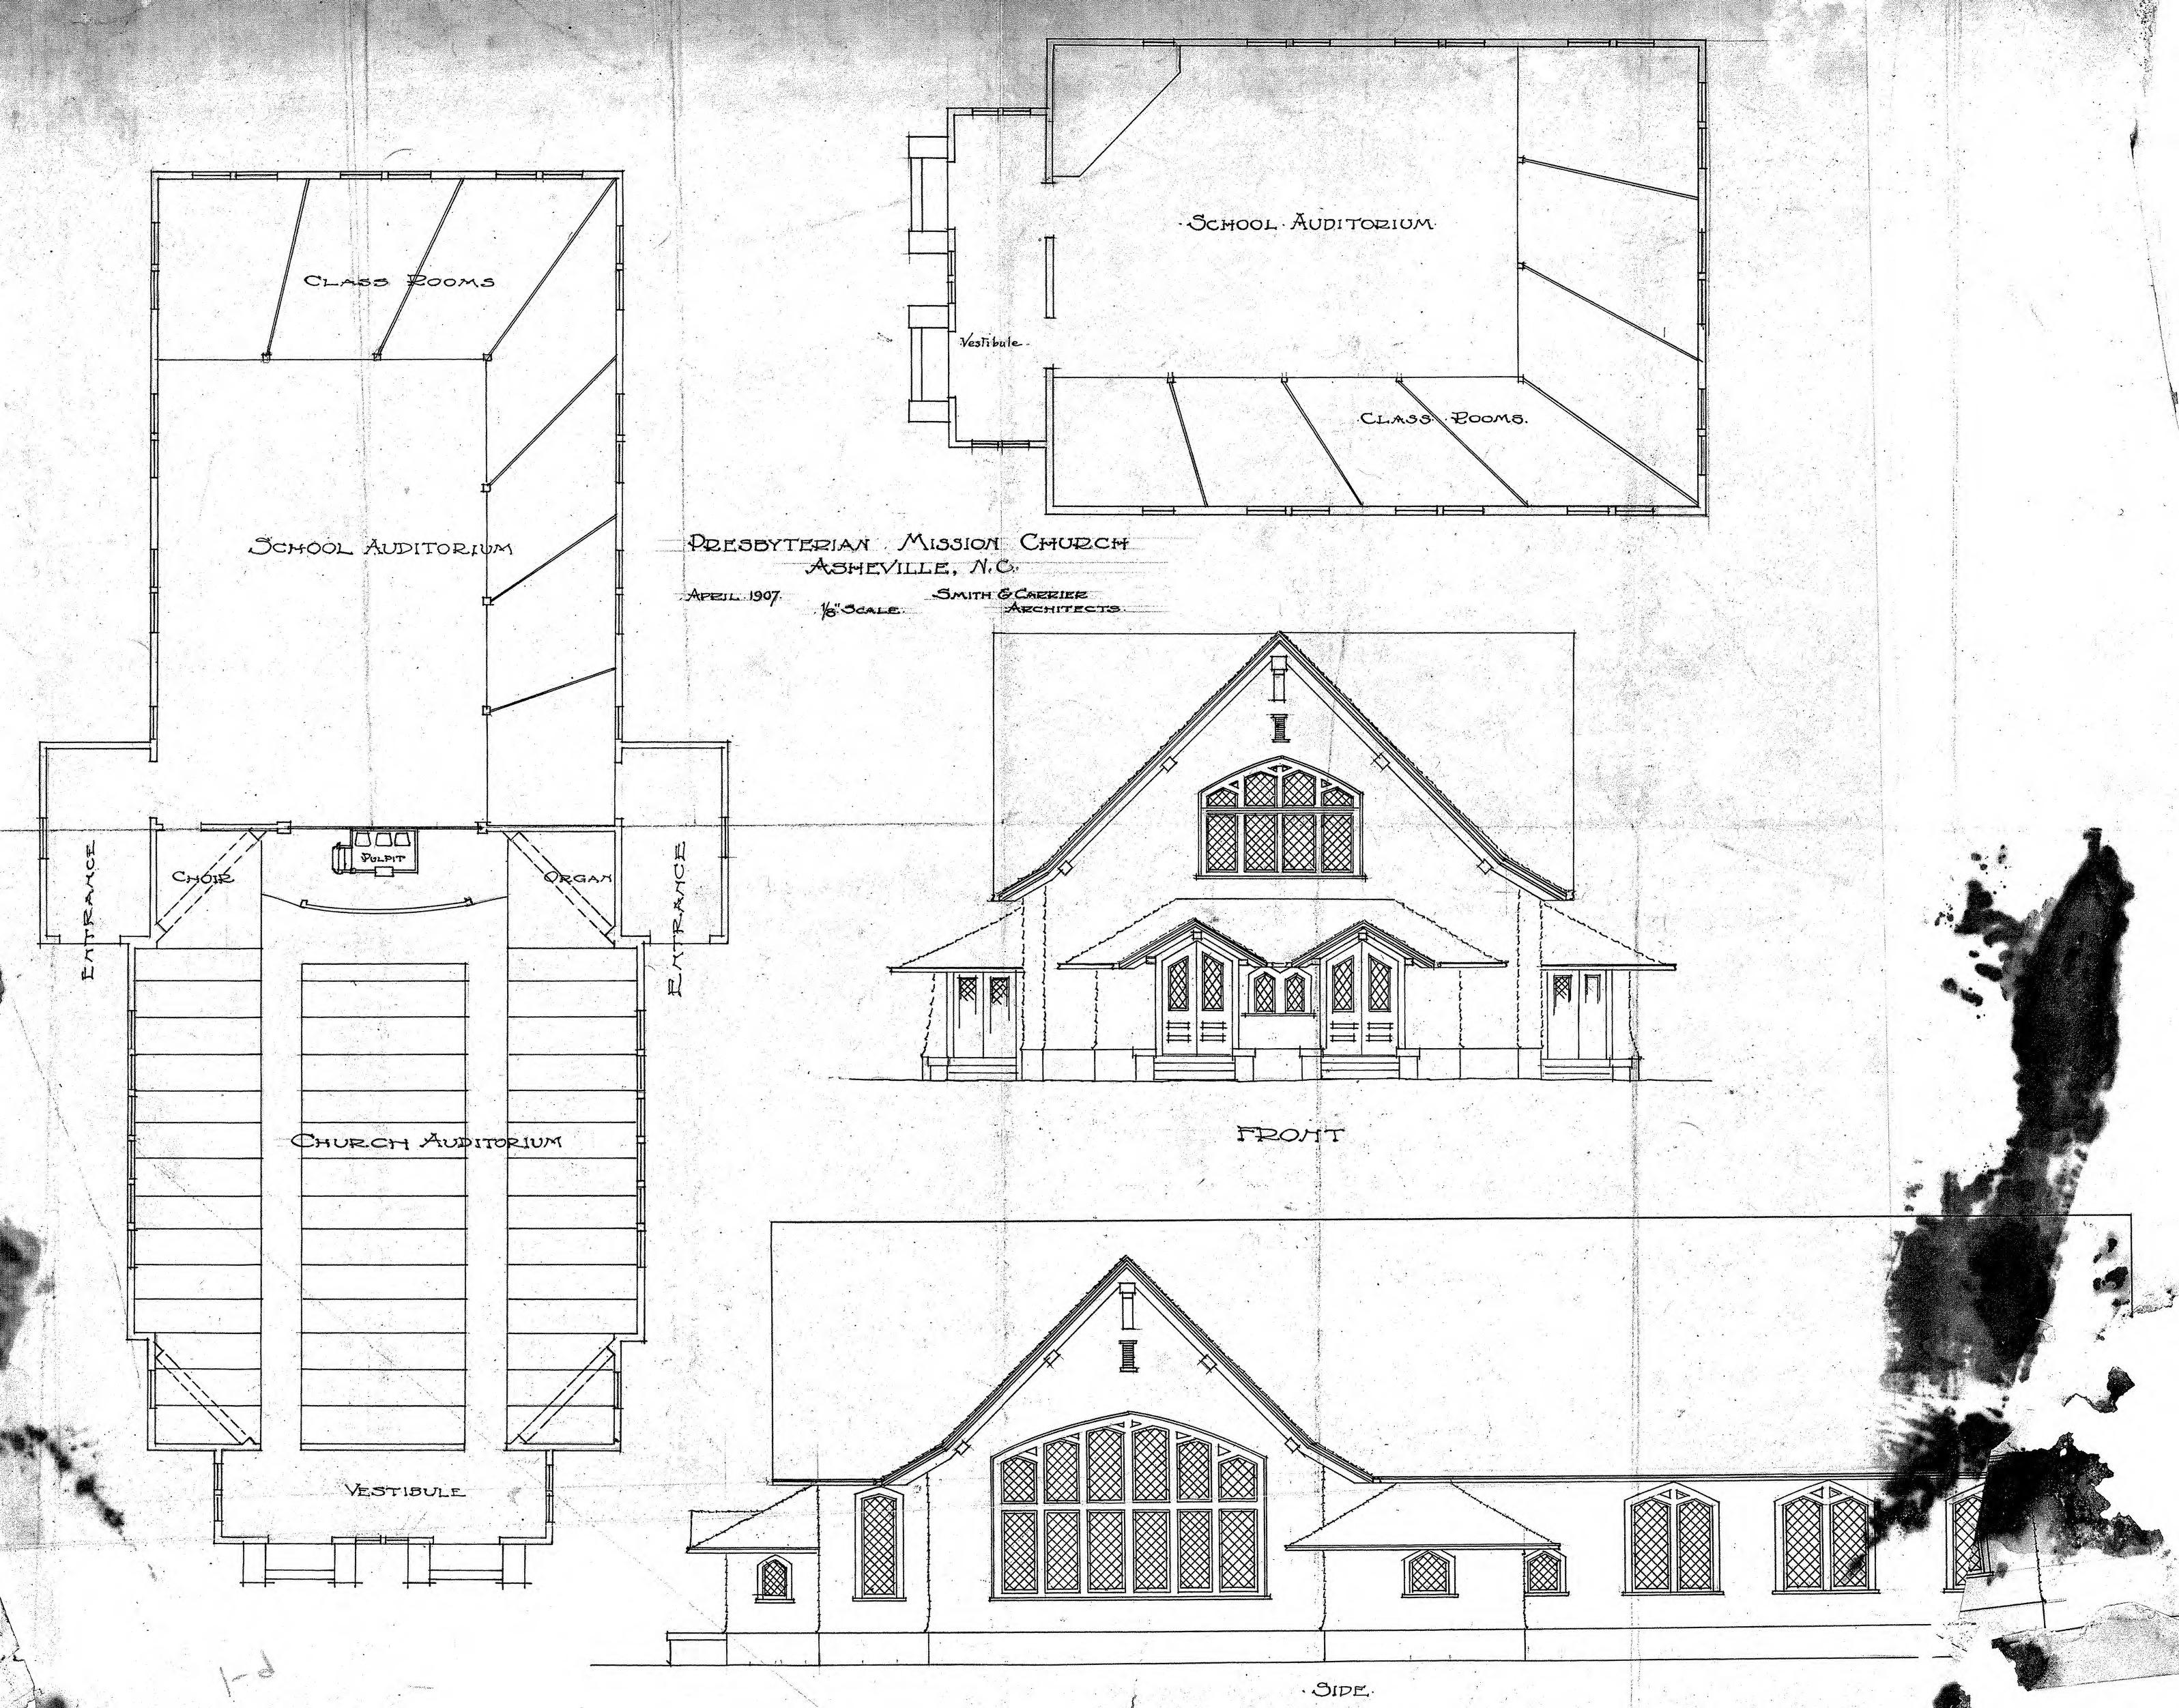 Church Elevation Plan : Presbyterian mission church floor plans and elevations